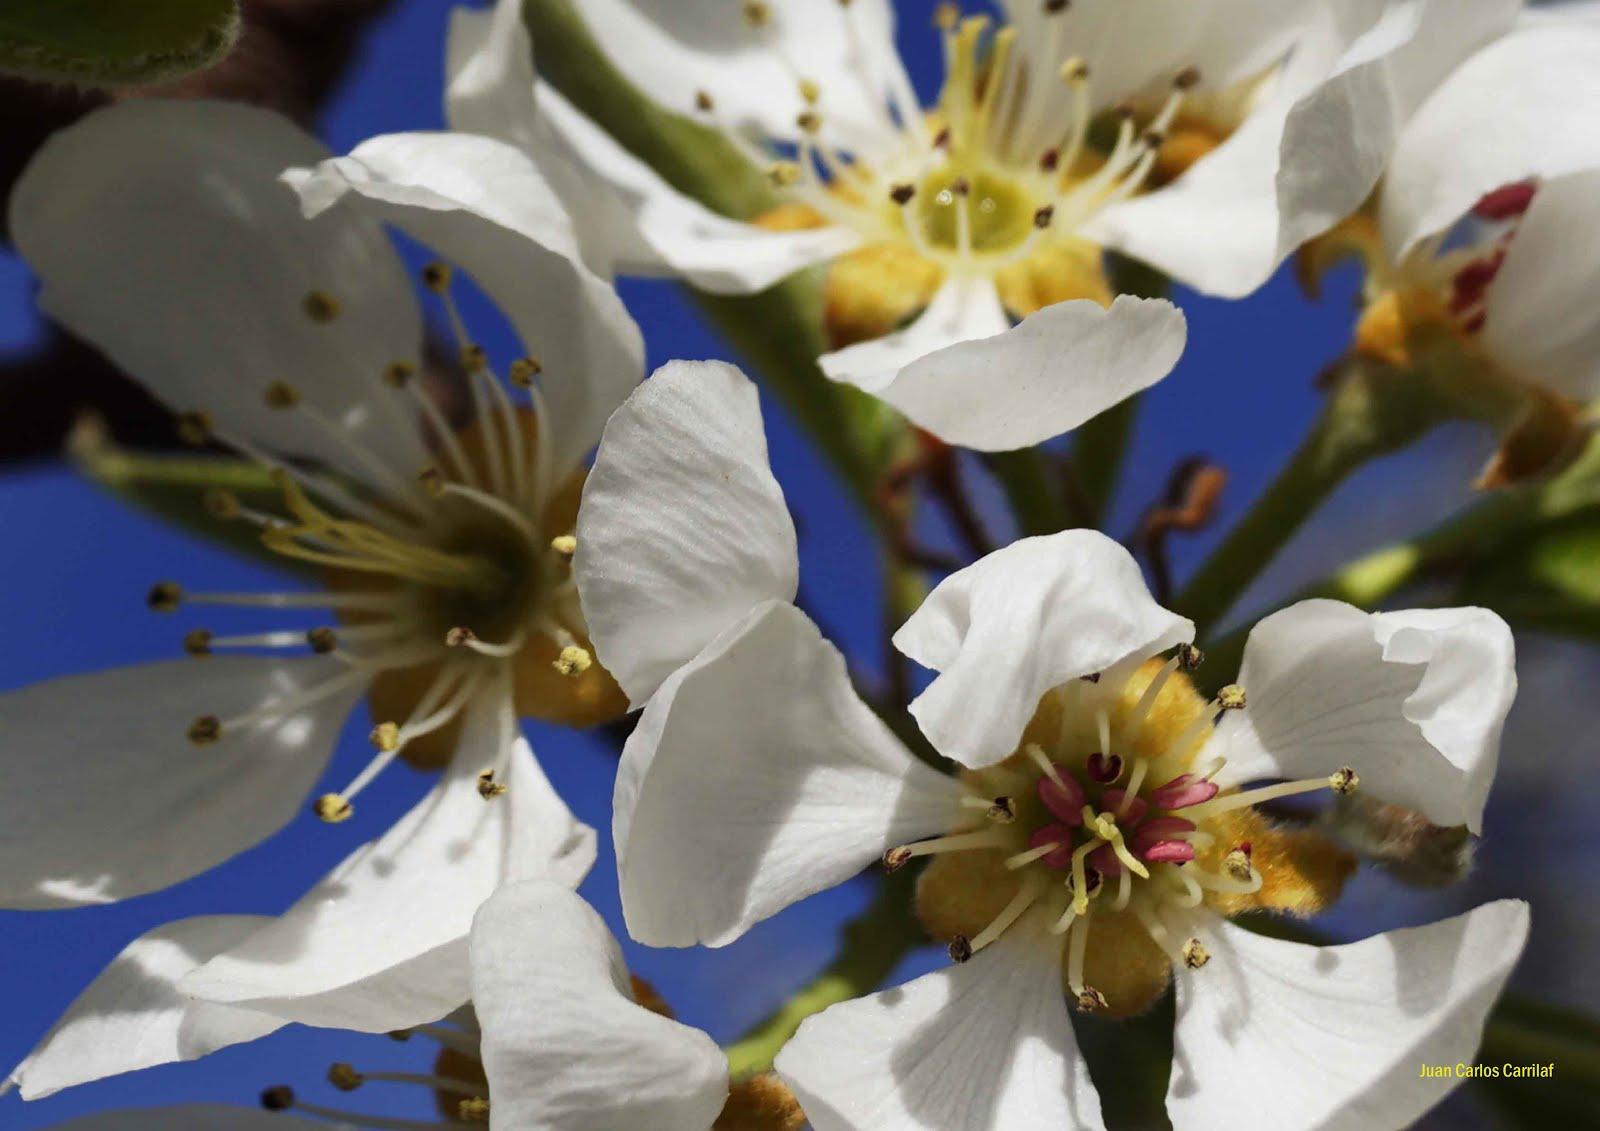 fotos de flor